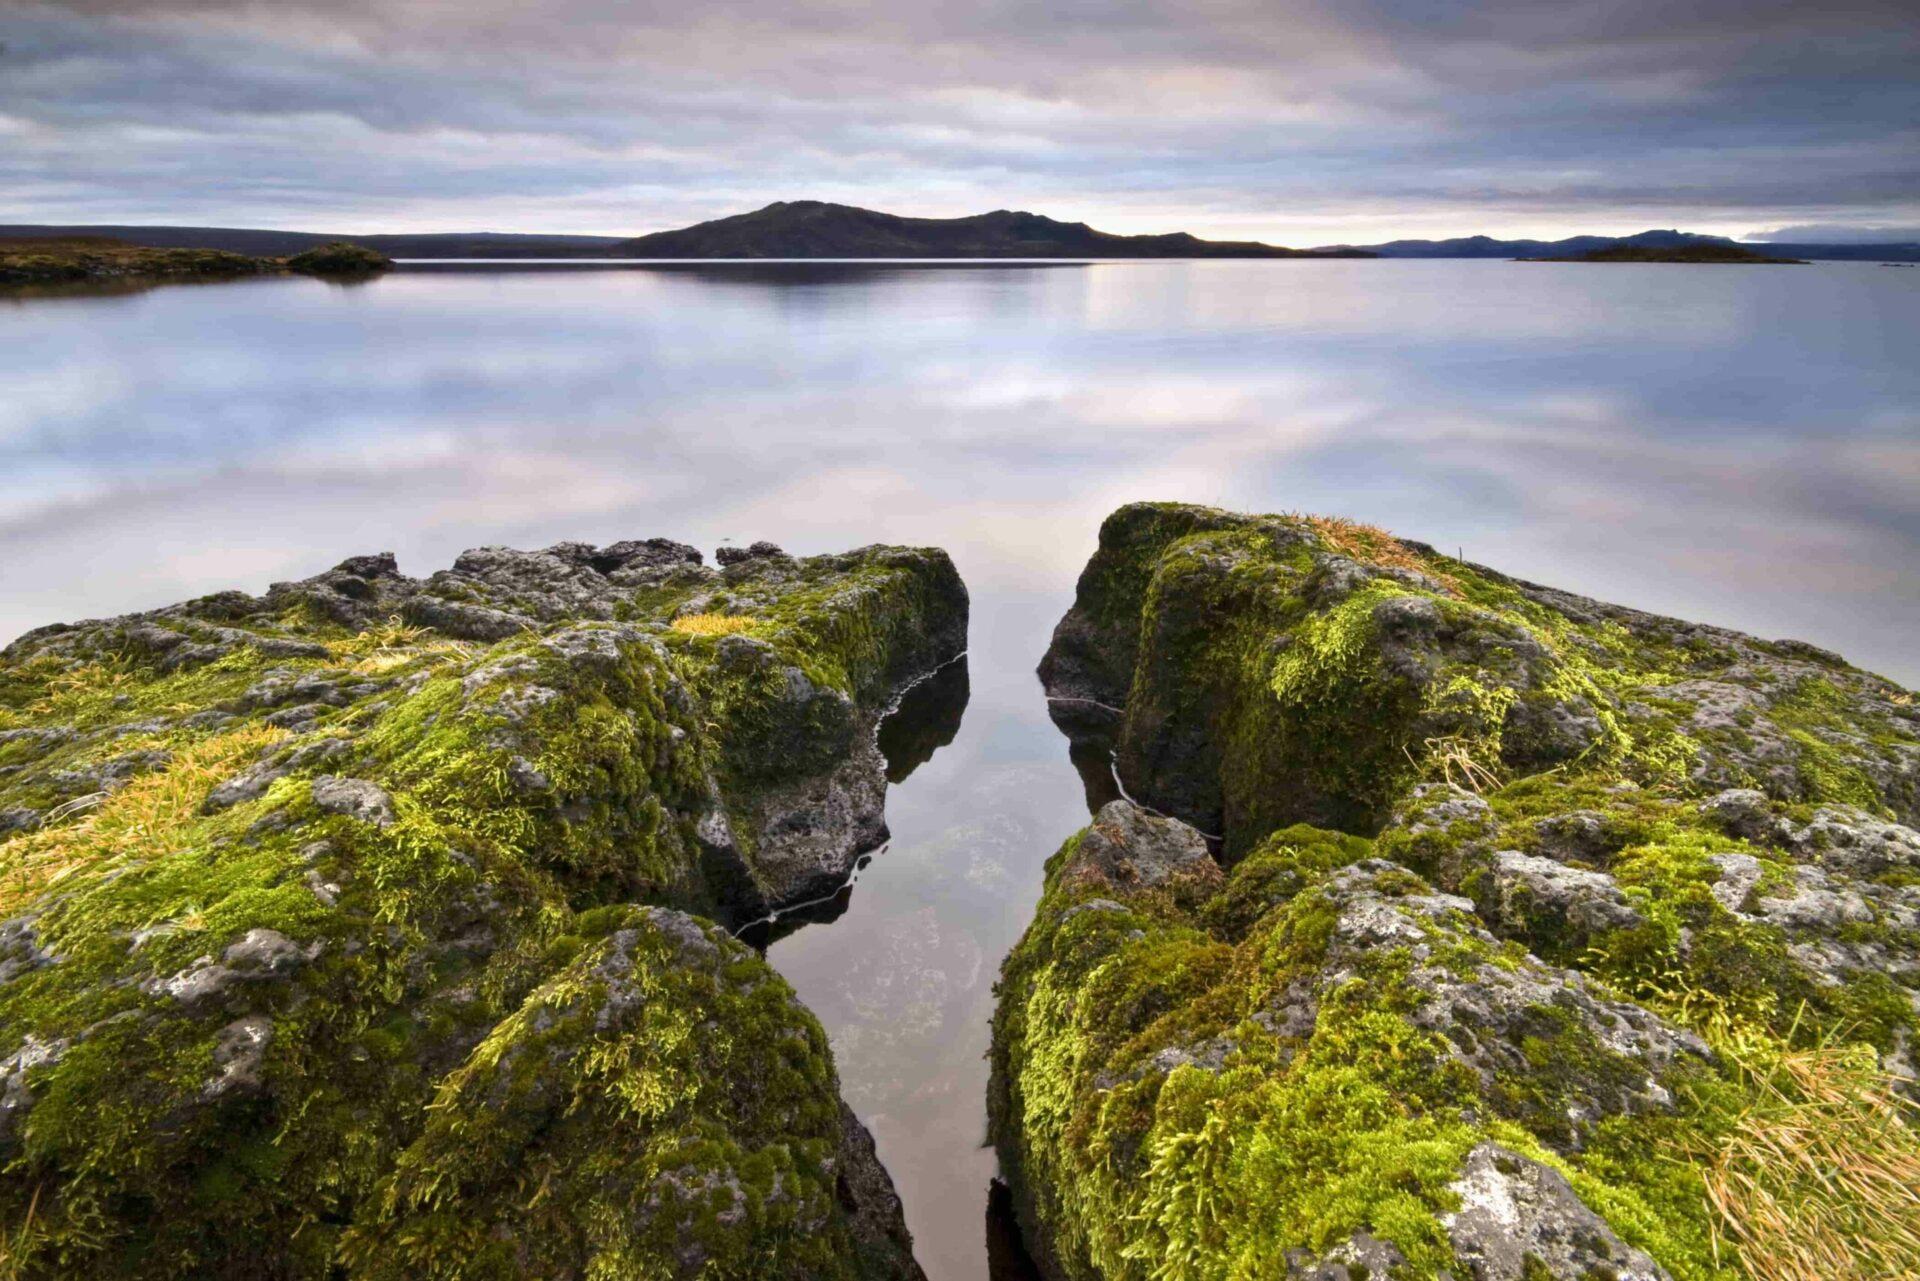 Thingvallavatn lake in Thingvellir National Park in Golden Circle